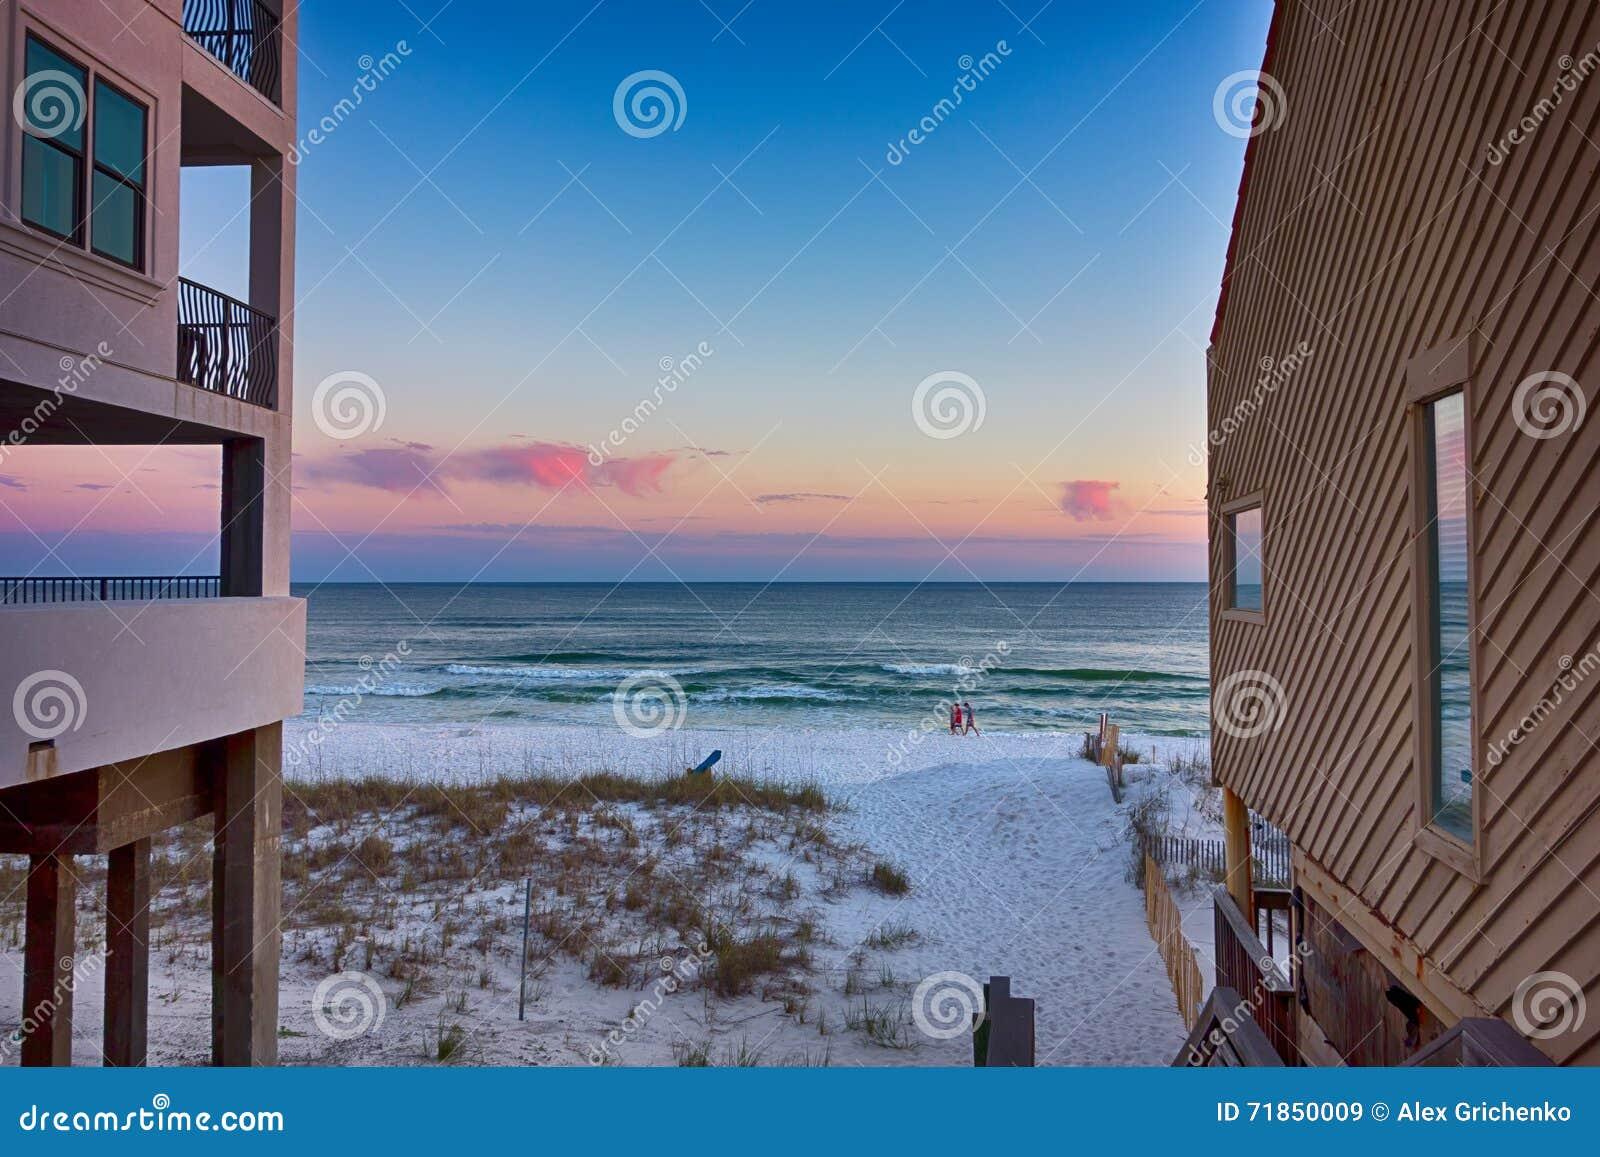 Florida beach parks and recreation